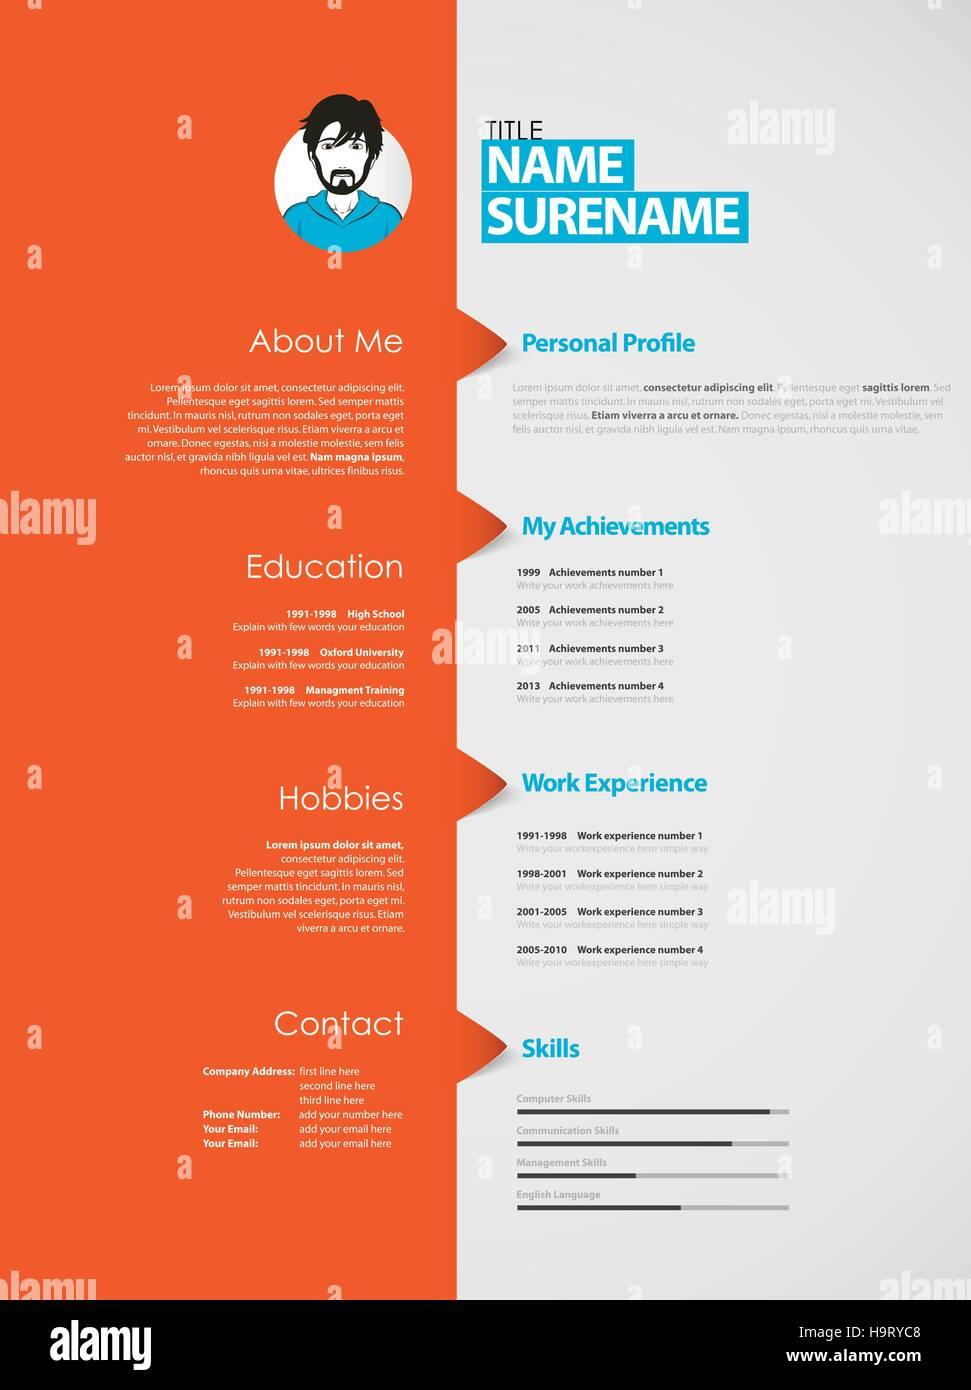 Curriculum Vitae Job Personal Info Imágenes De Stock & Curriculum ...